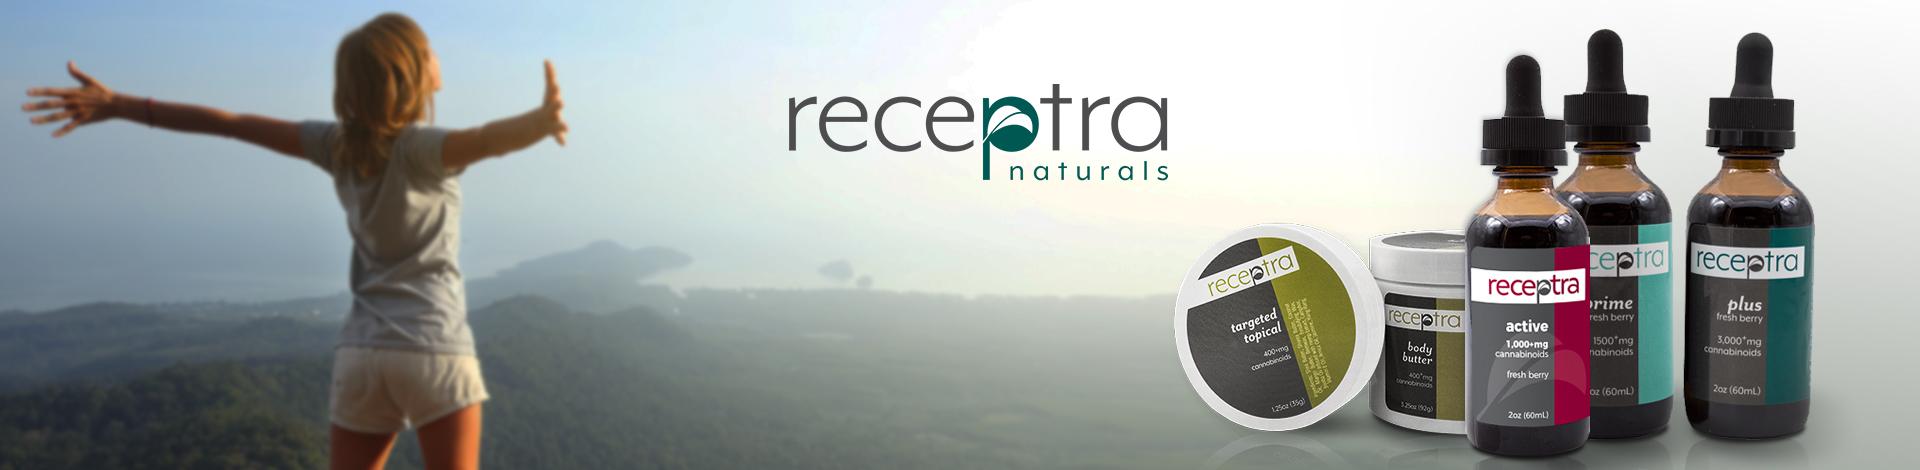 banner main Receptra Naturals